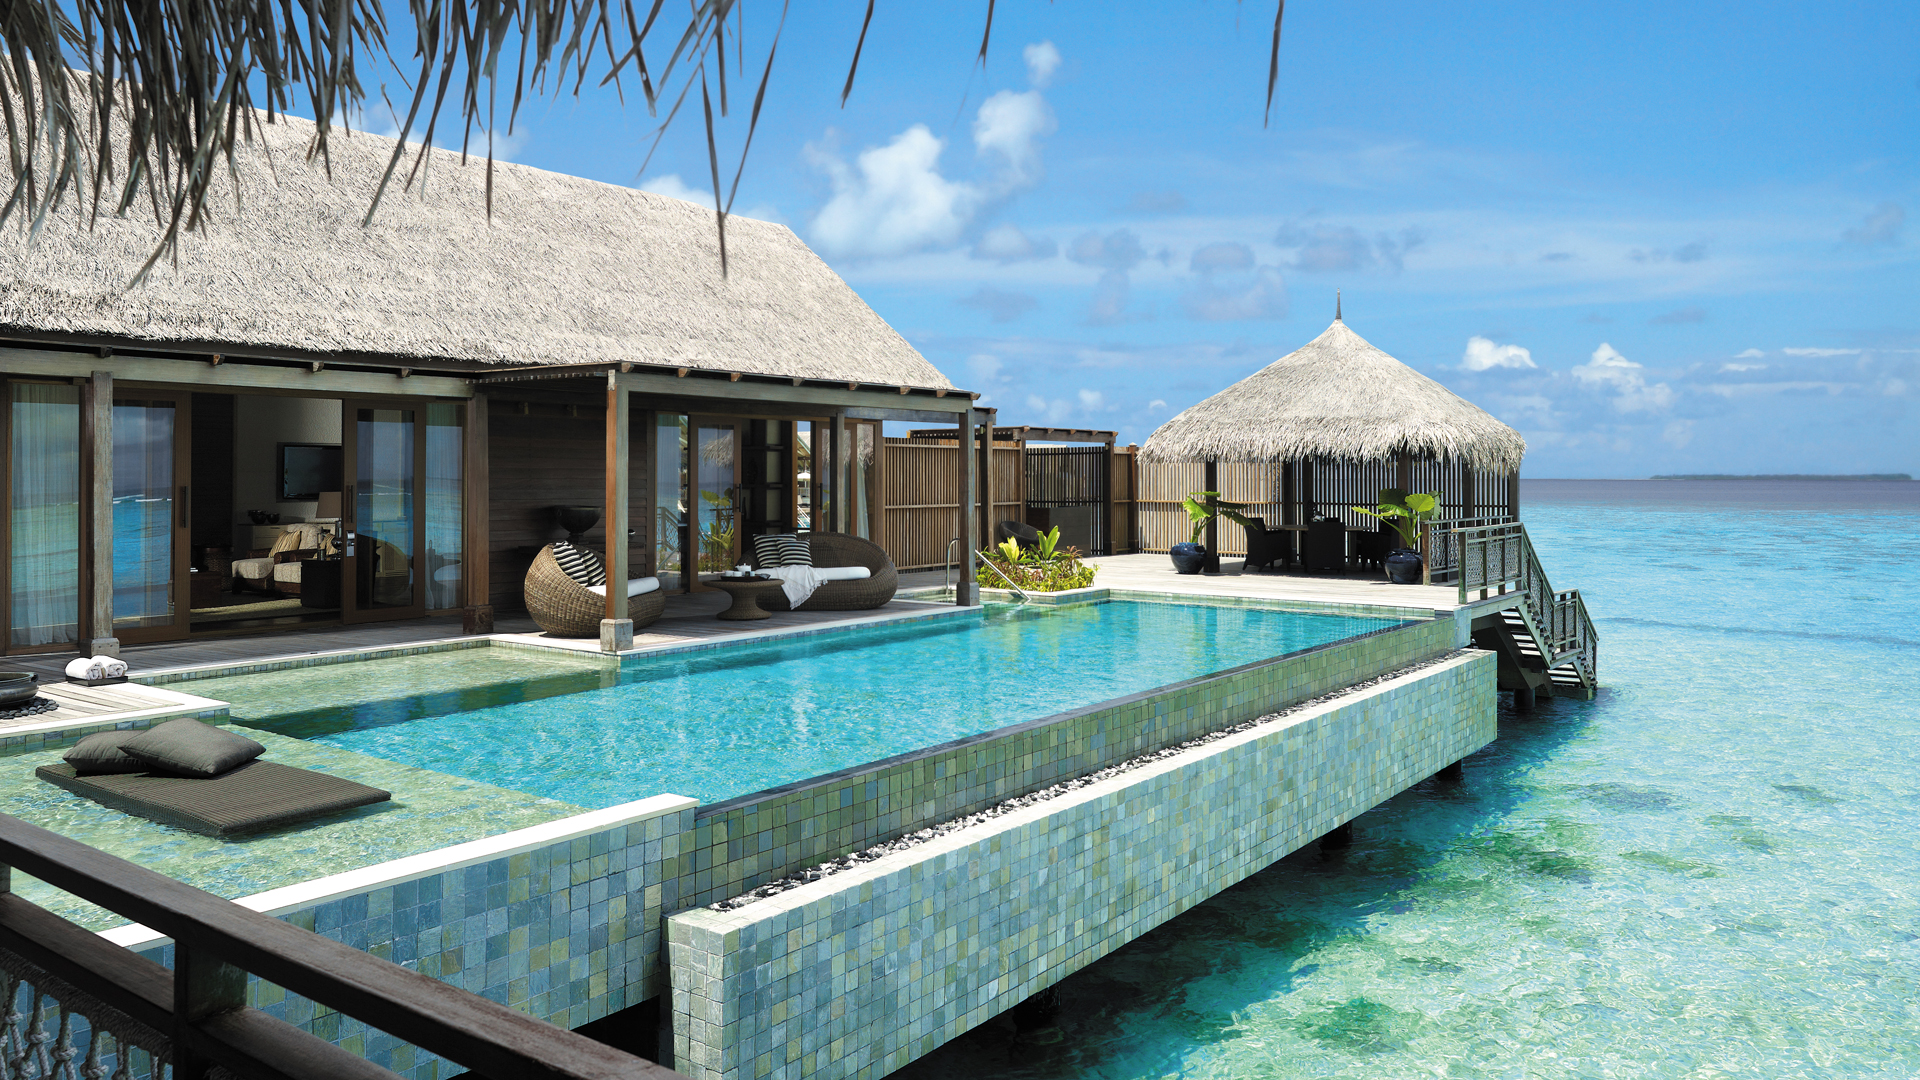 Shangri La S Villingili Resort And Spa Addu Atoll In